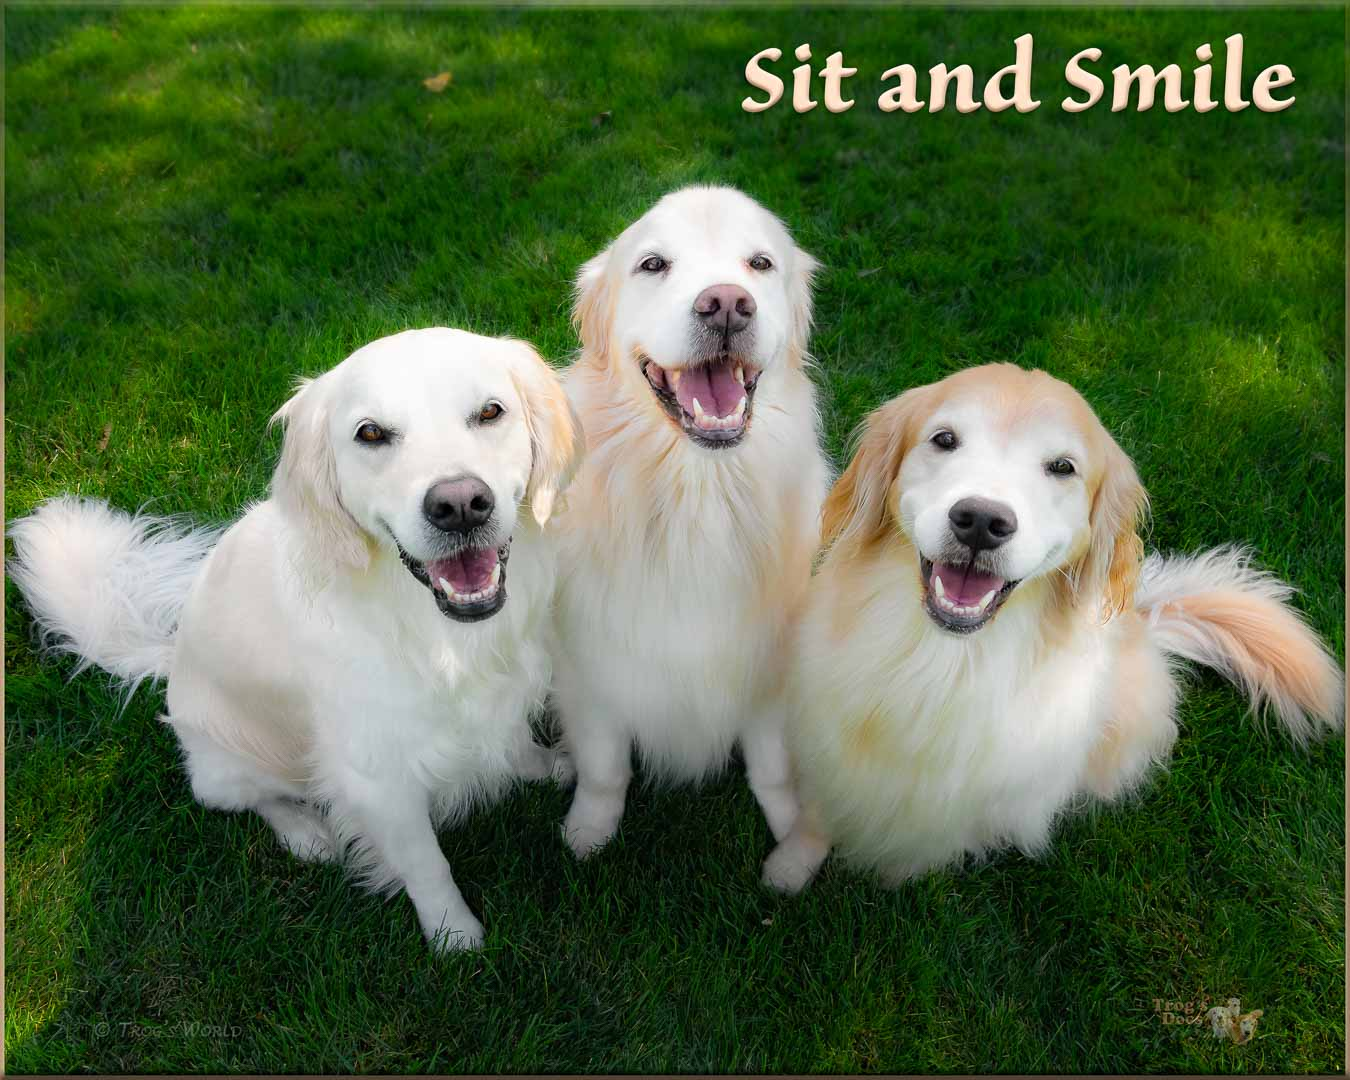 Three Golden Retrievers smiling in the sun